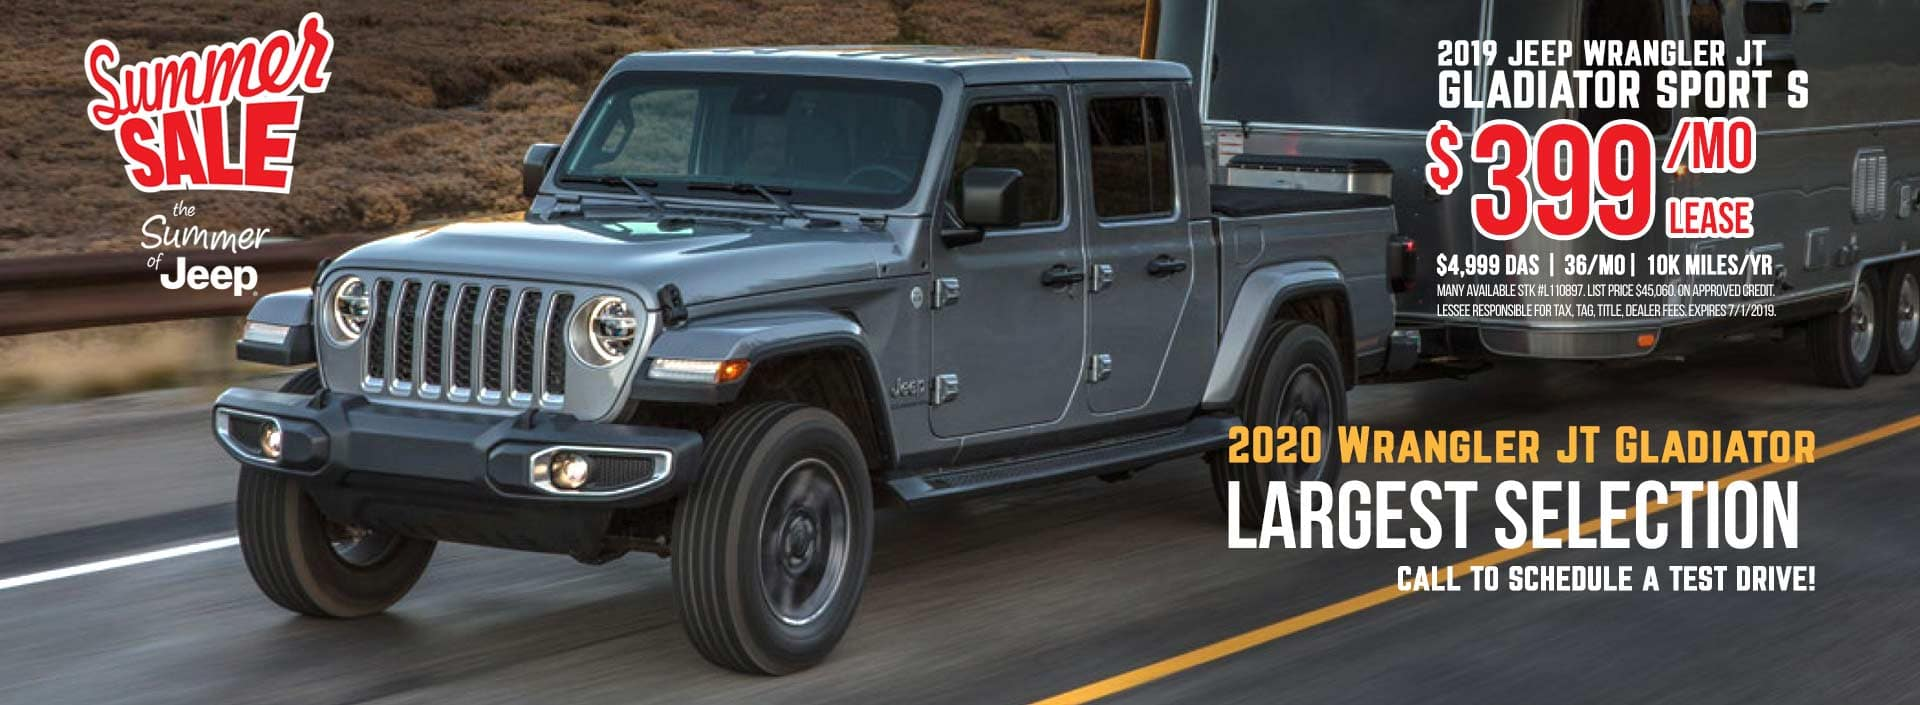 Jeep Wrangler Gladiator Sale